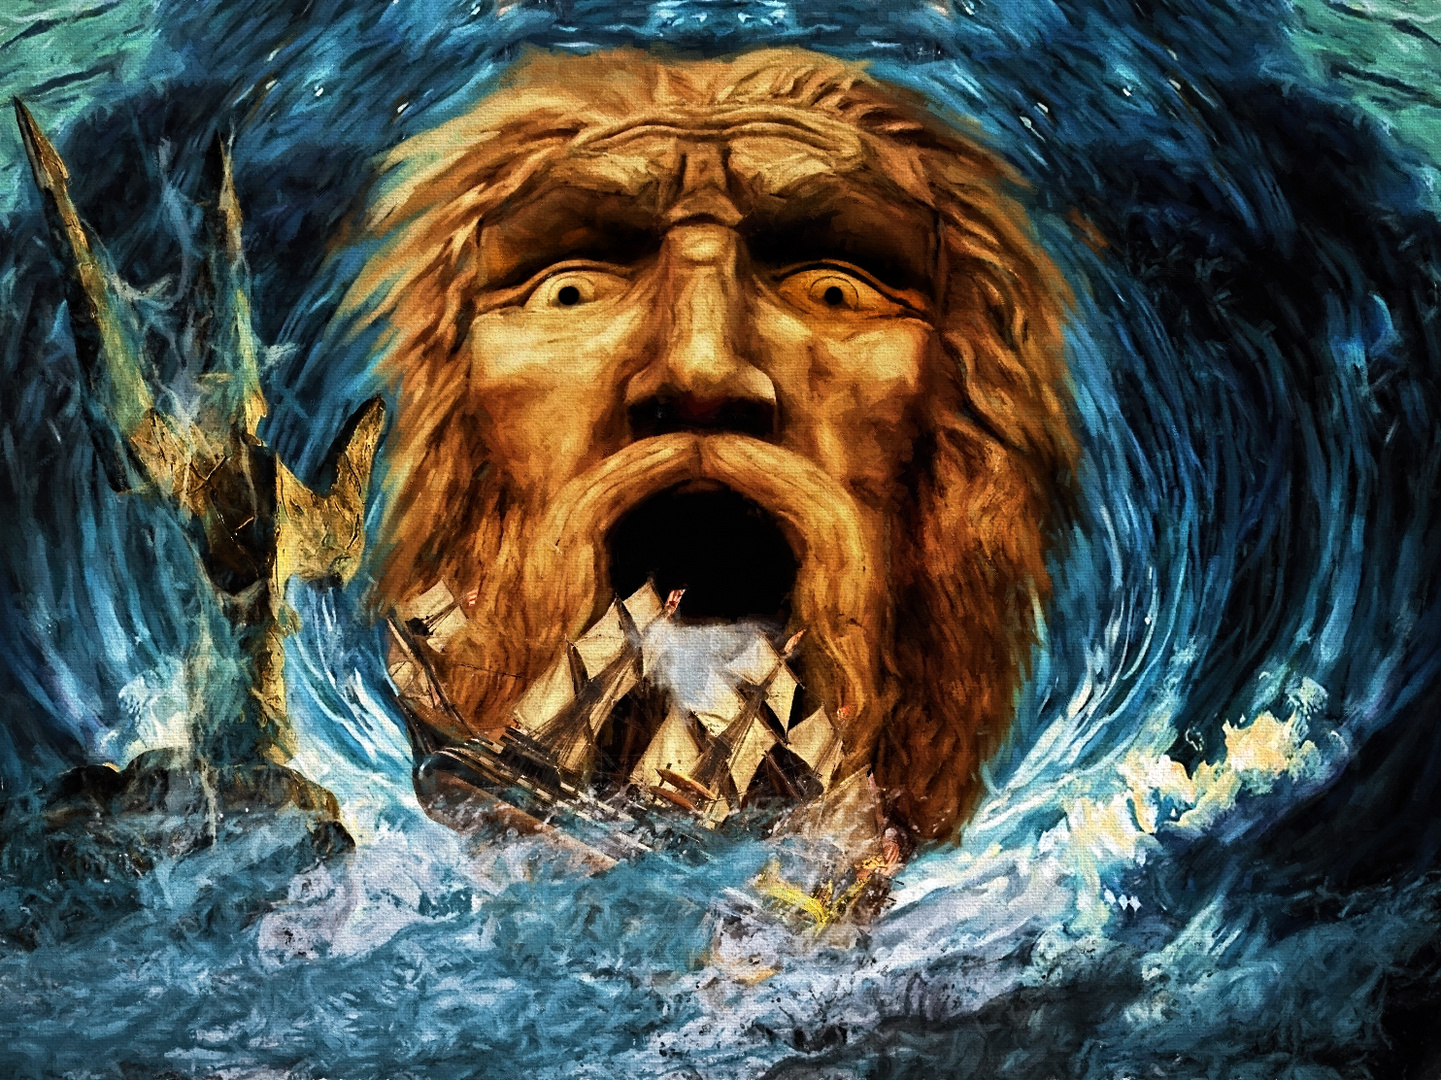 Poseidons Zorn